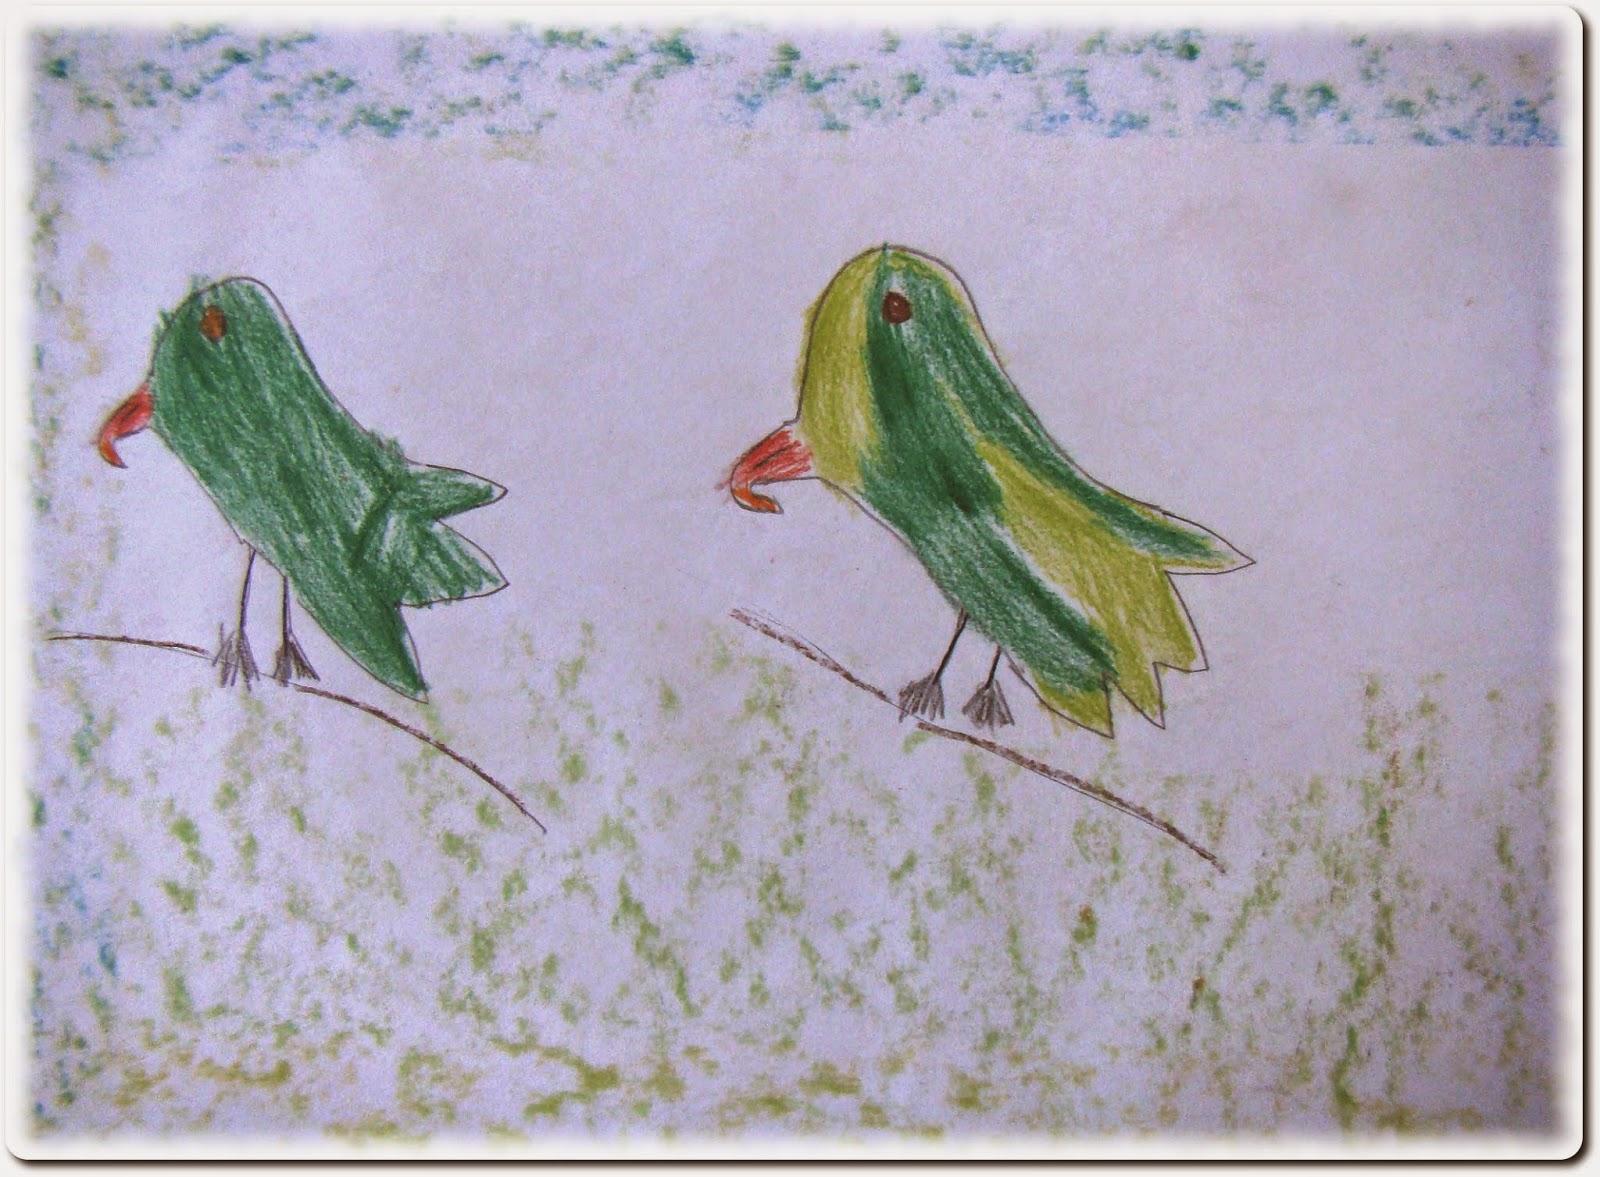 'Pássaro livre'